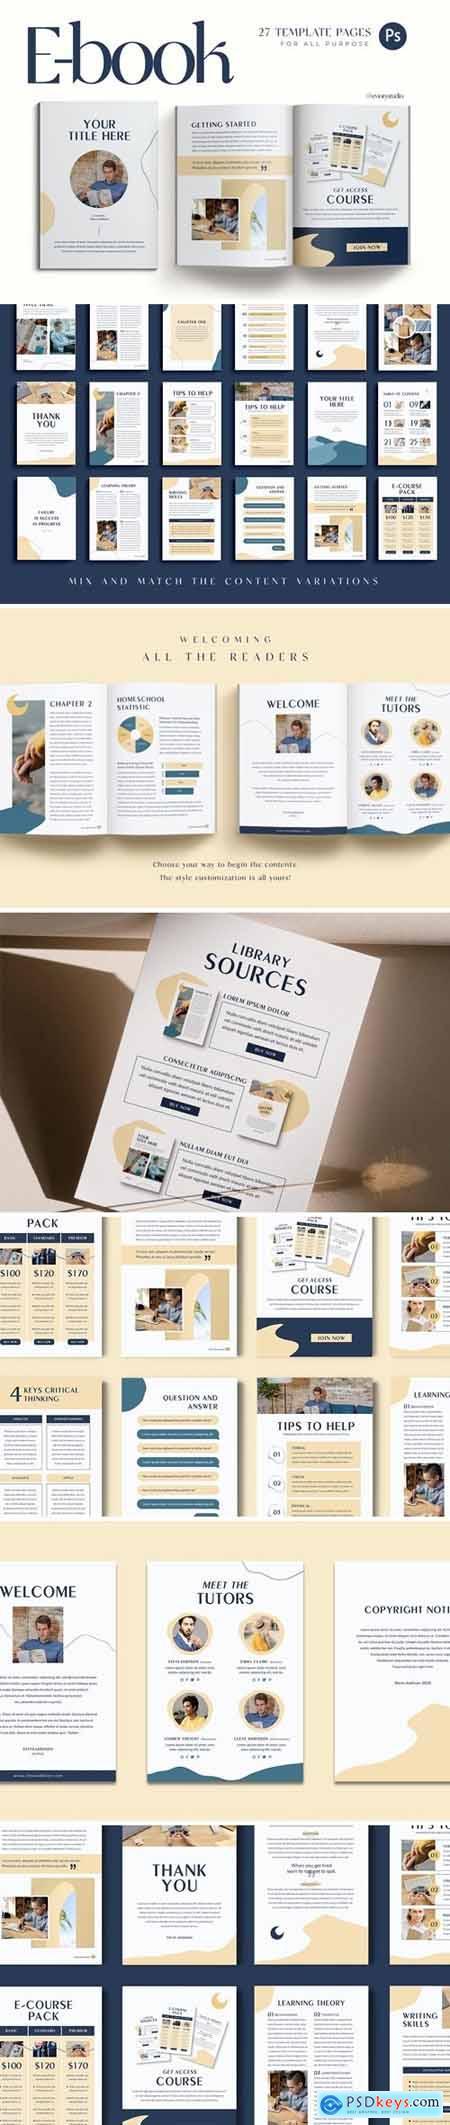 Education - eBook Creator for Coach